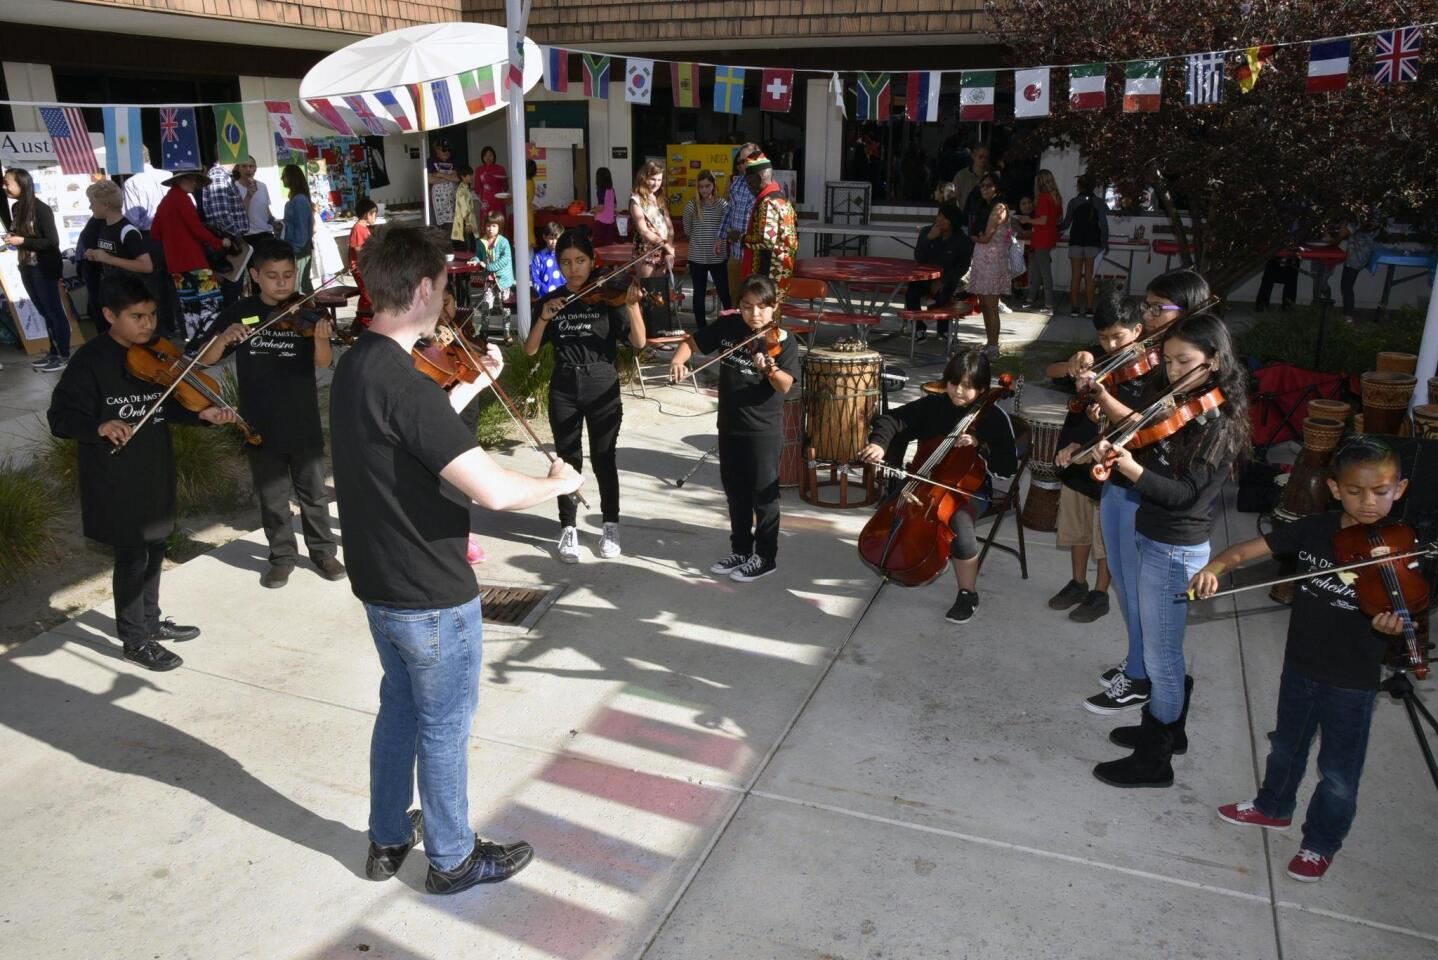 The Casa de Amistad Orchestra performed